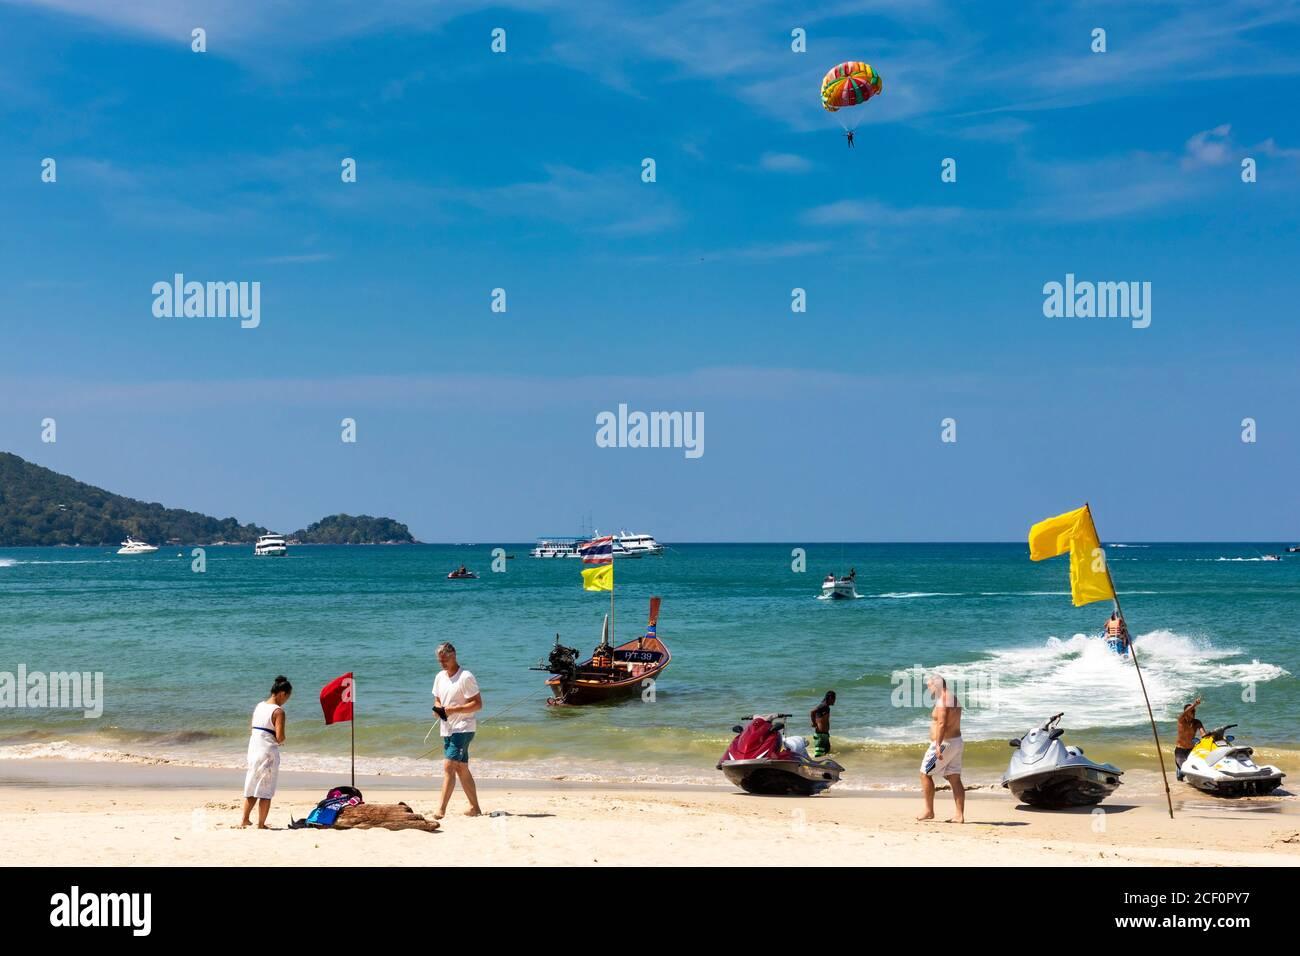 Parasailing above the sea, Patong Beach, Phuket, Thailand Stock Photo